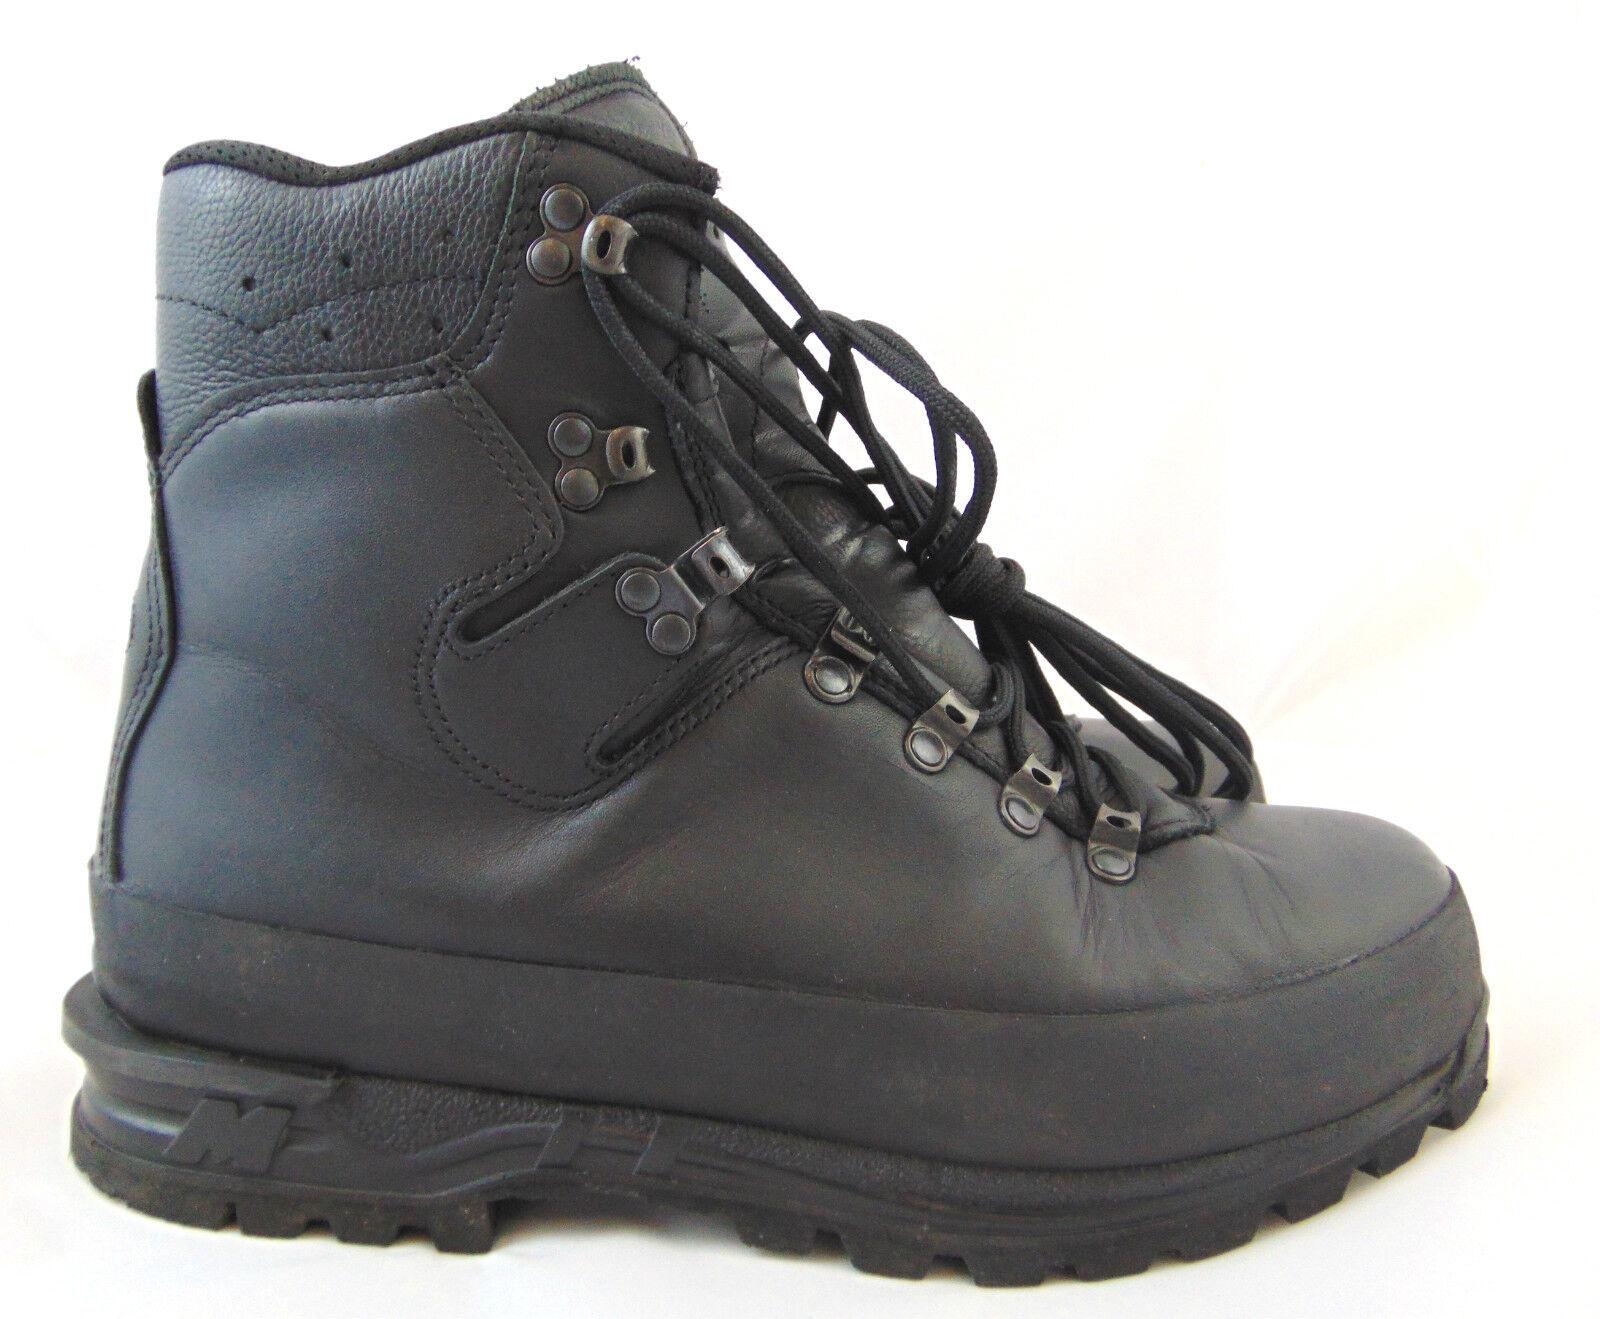 Meindl Goretex Vibram Suela de Cuero  Impermeable botas de hardware tamaño 7, 7.5, 8, 8.5  muy popular